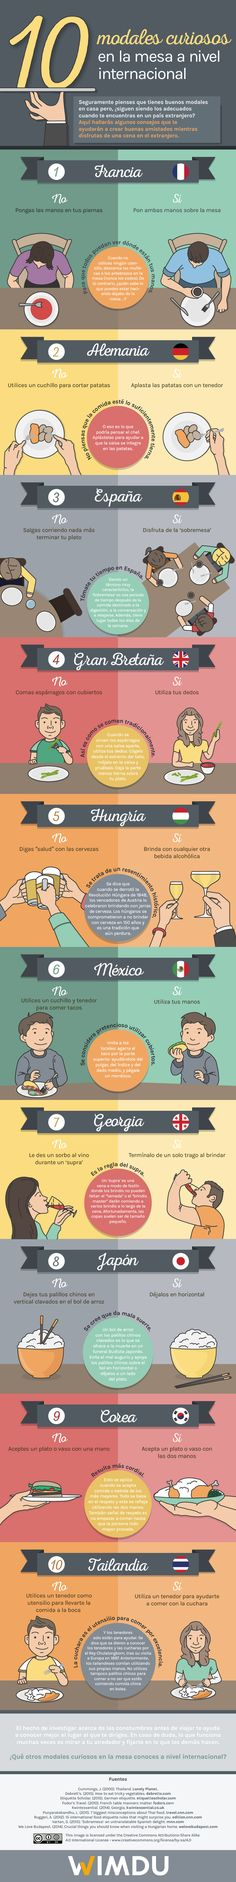 10 modales curiosos en la mesa a nivel internacional #infografia #infographic #tourism